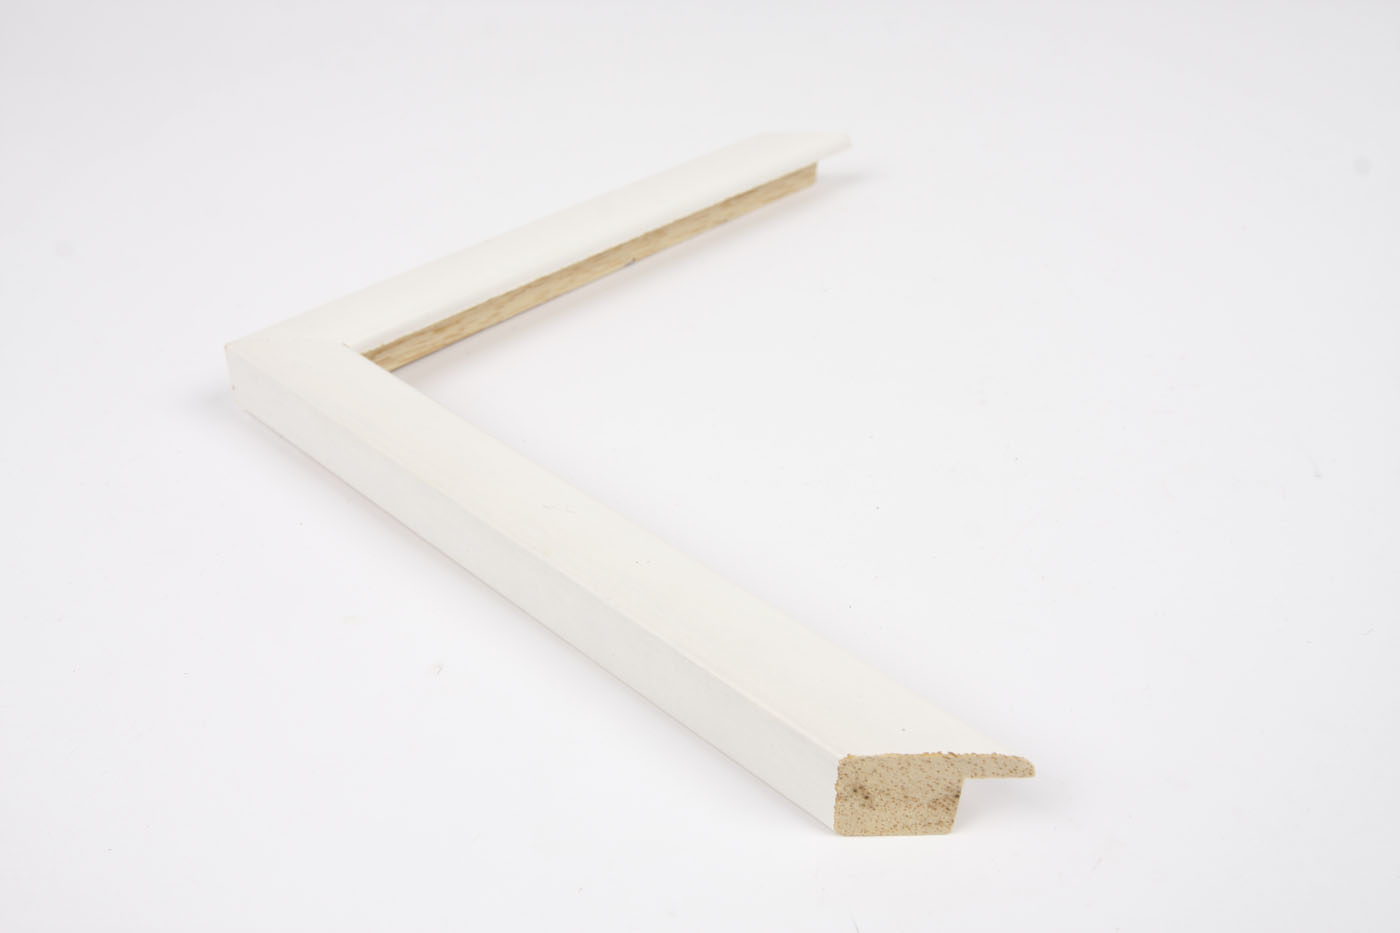 00290-100-BLAN-ancho1,8cm-perfil